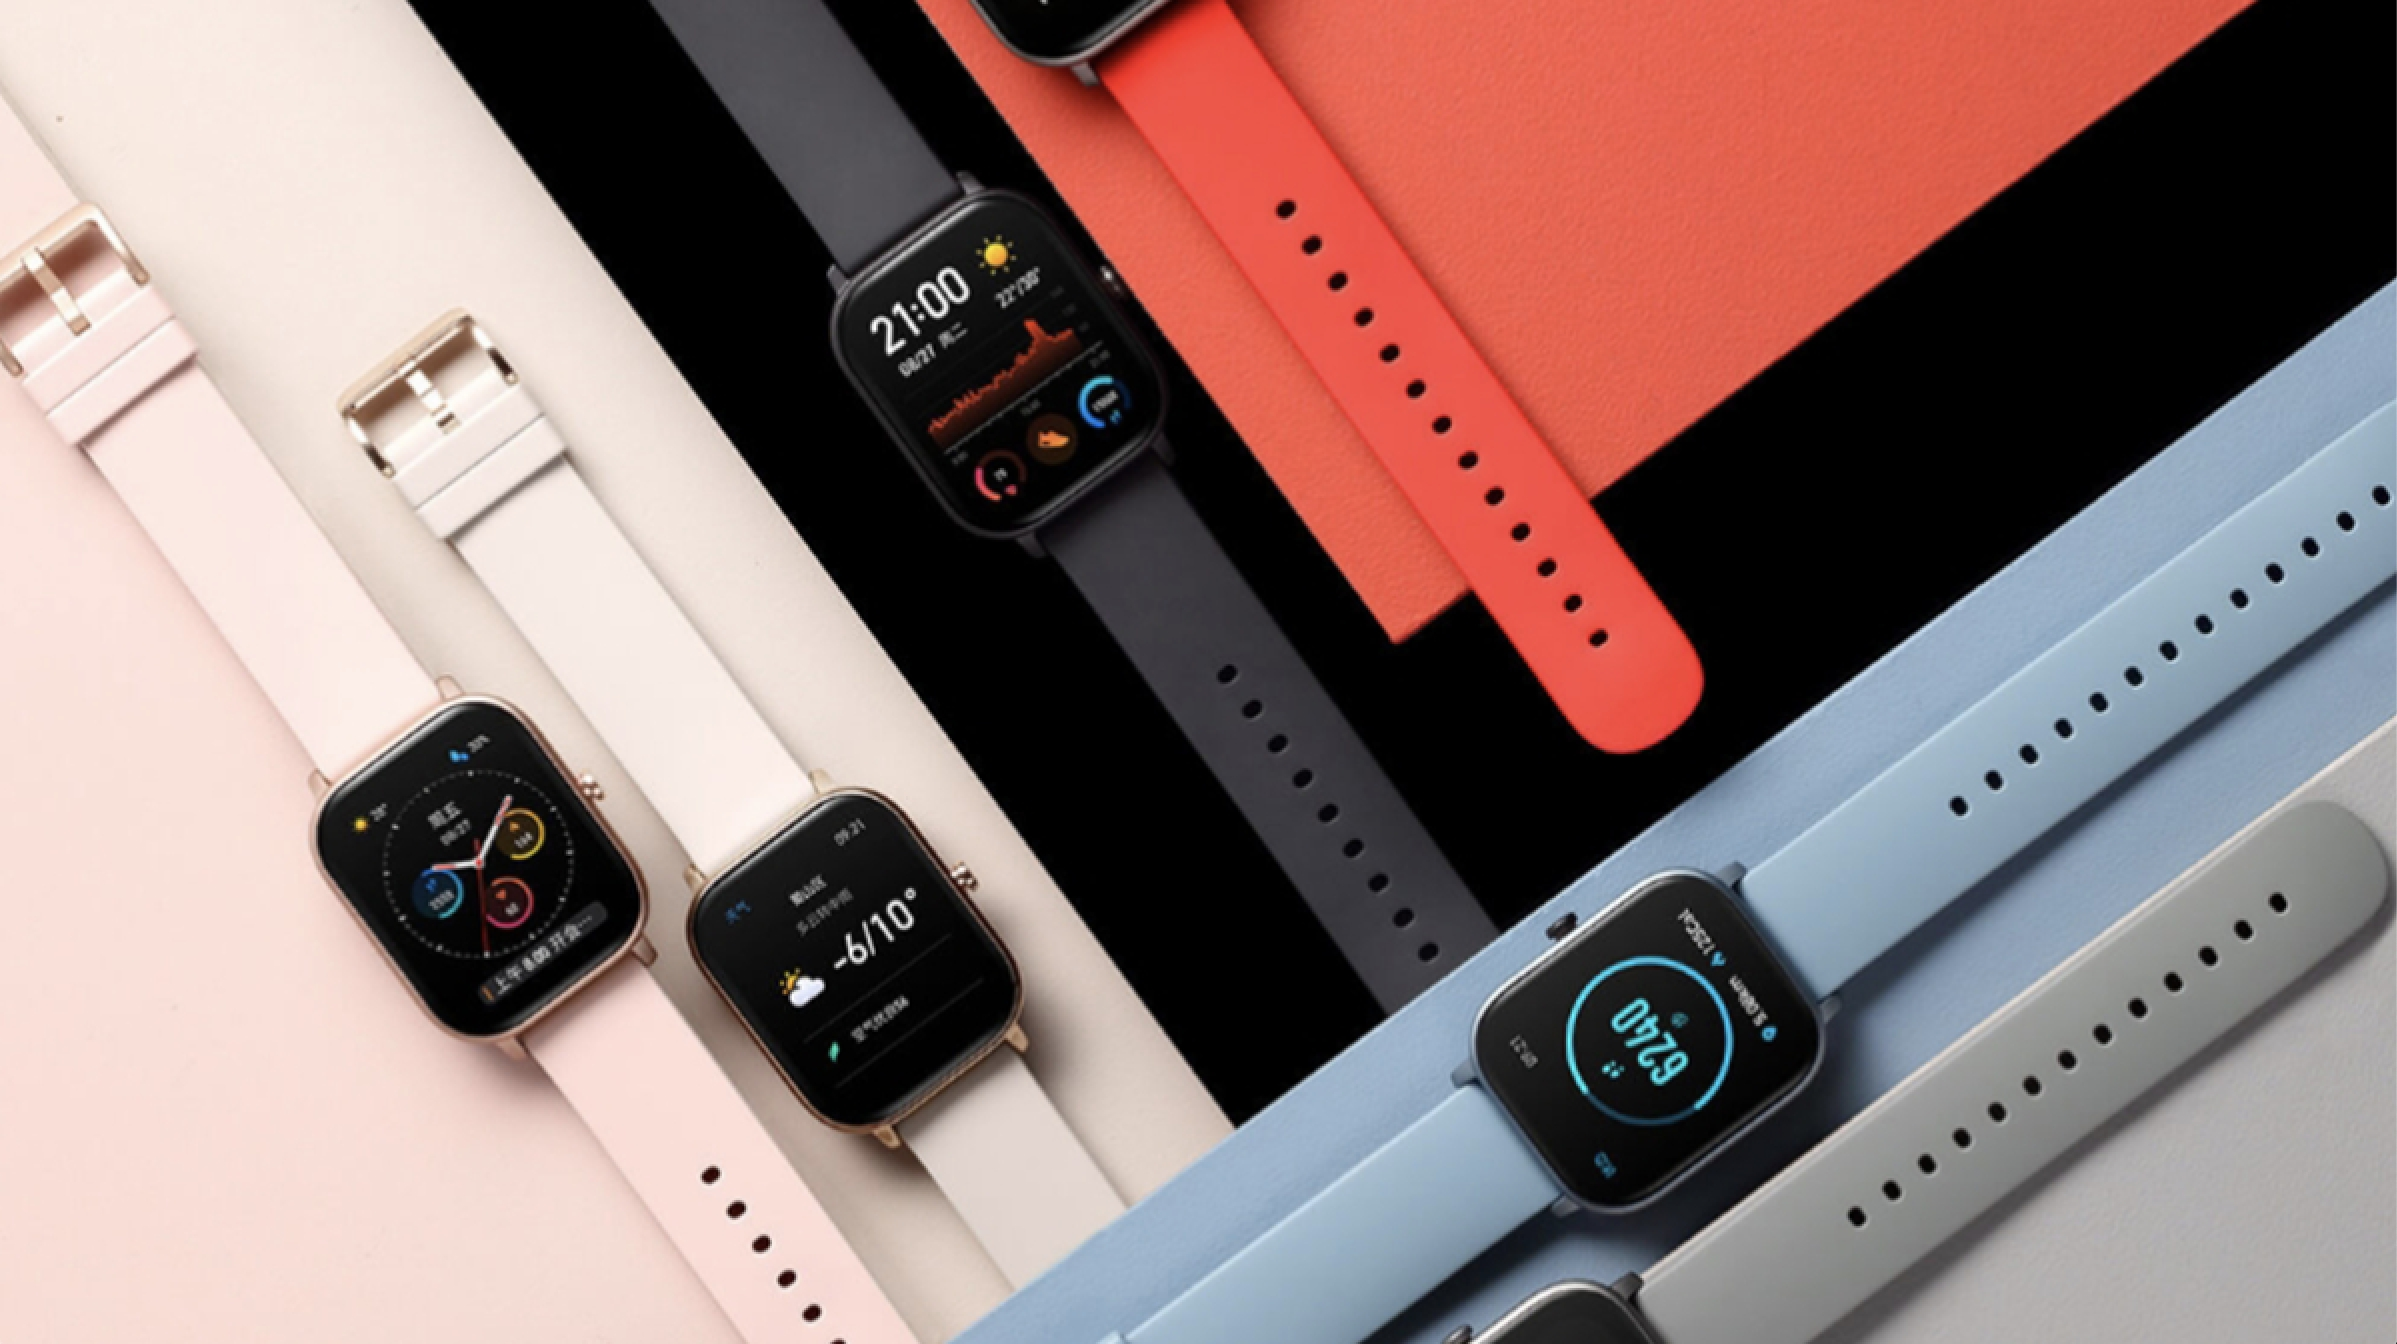 Slevový kupón na nové hodinky Huami Amazfit GTS! [sponzorovaný článek]